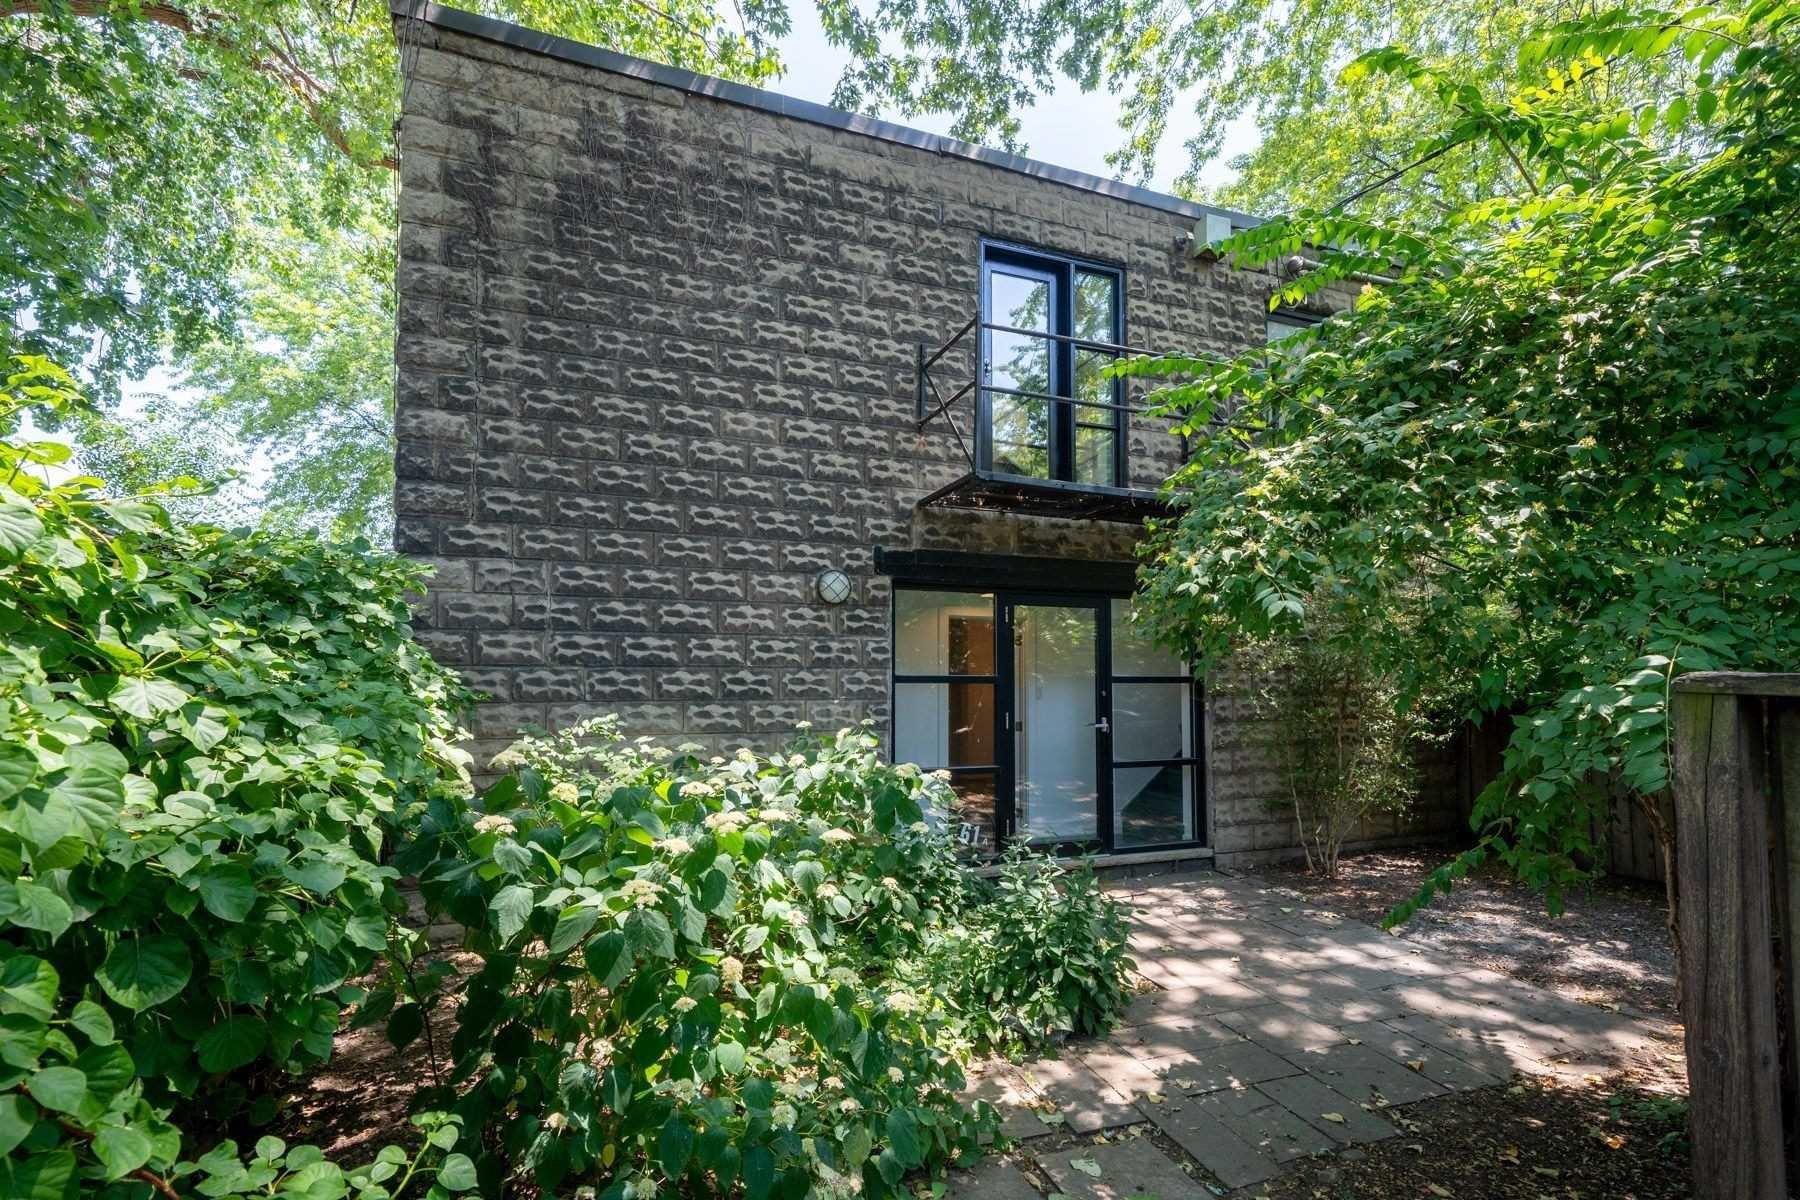 Main Photo: 61A Morse Street in Toronto: South Riverdale House (2-Storey) for sale (Toronto E01)  : MLS®# E4828108